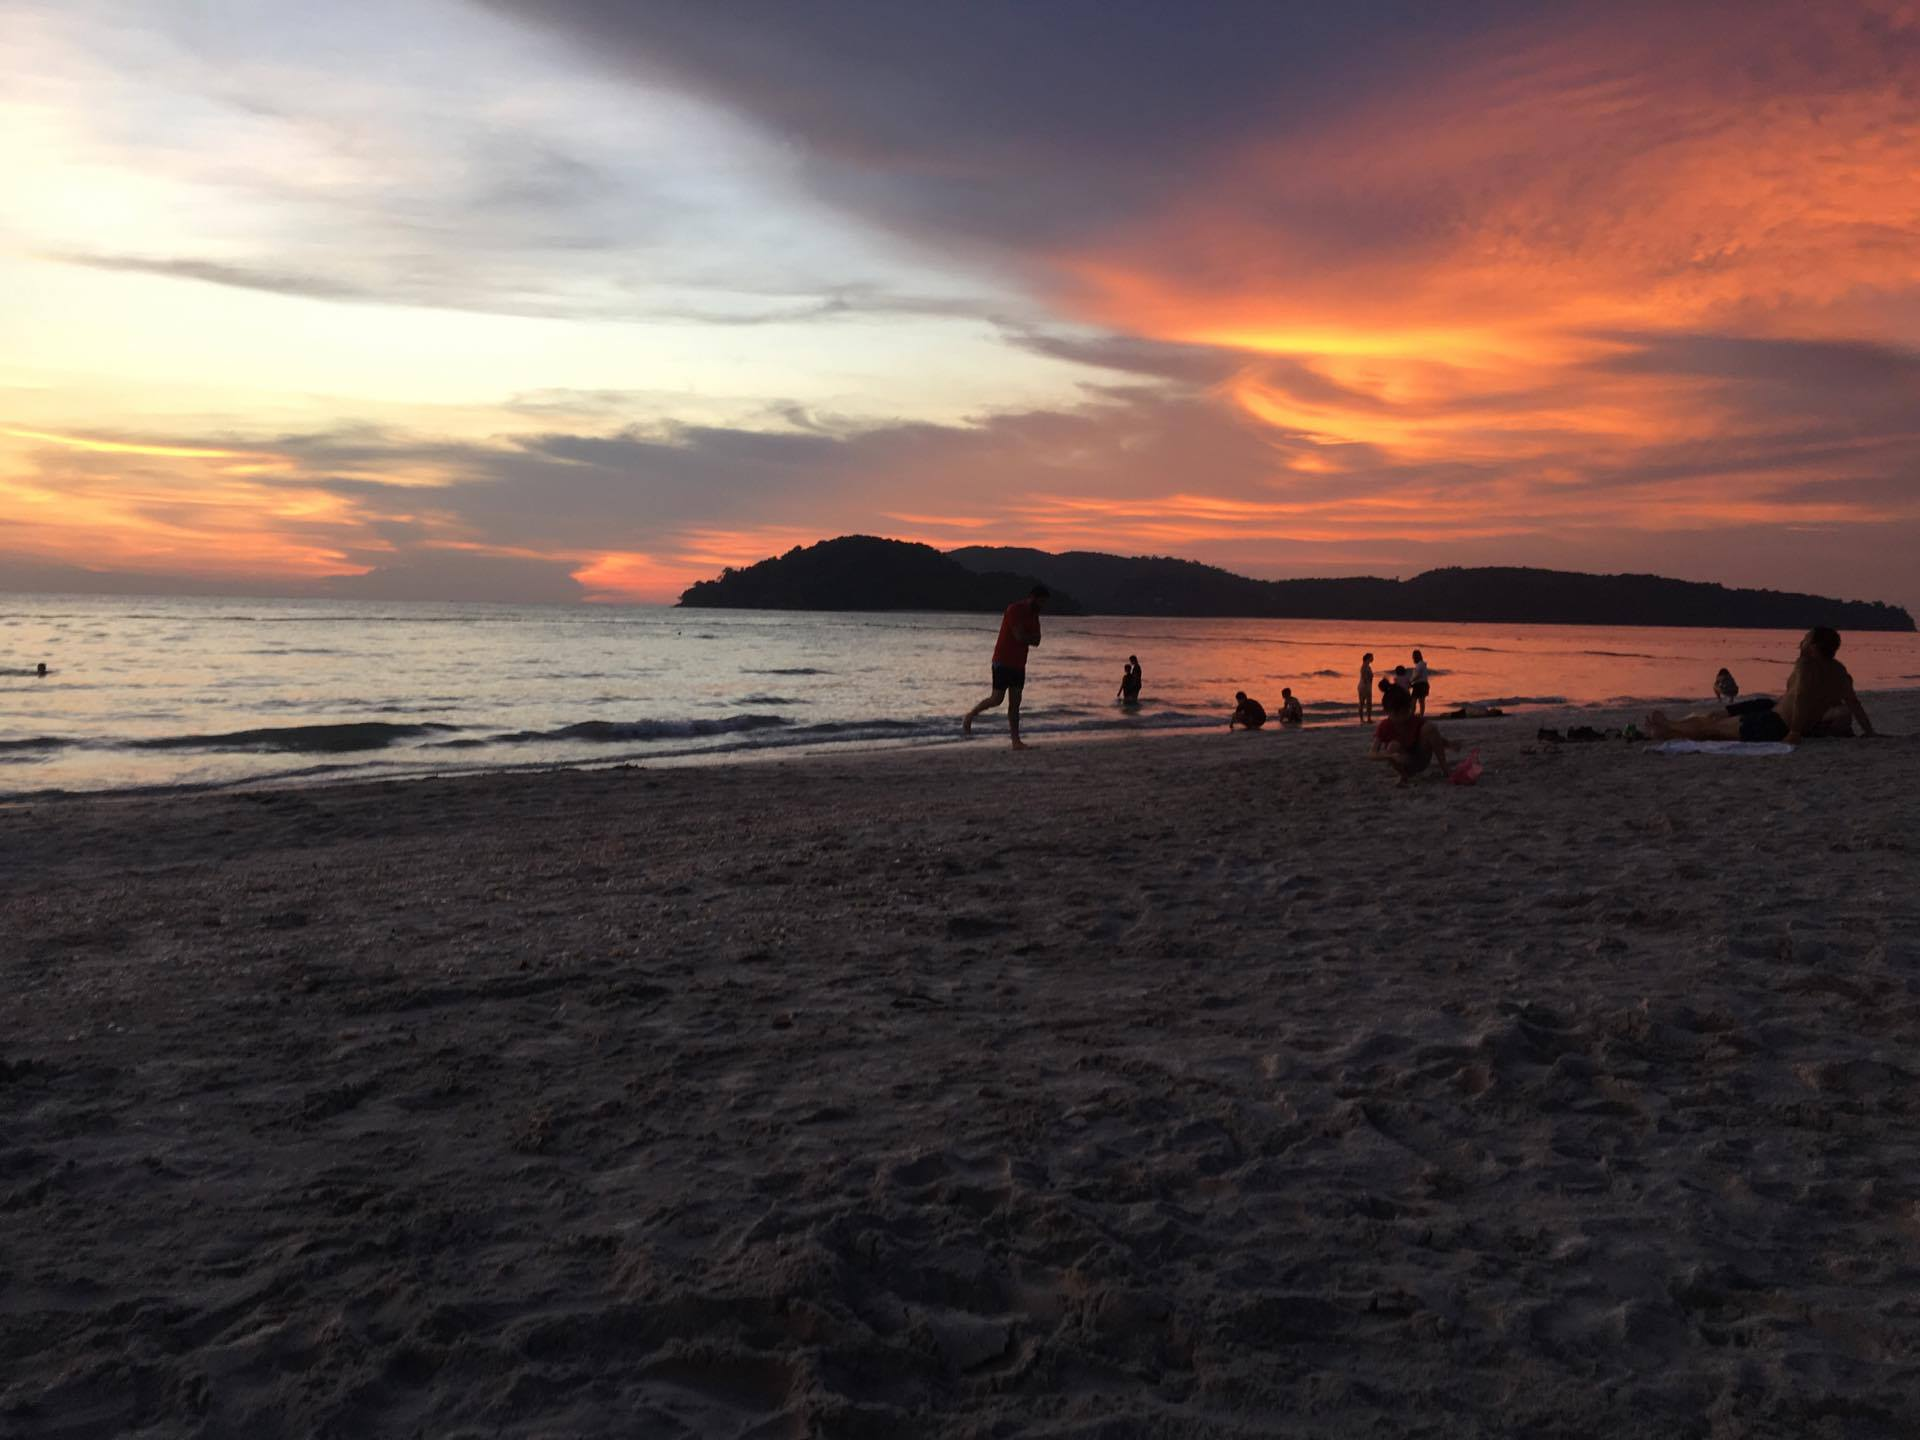 Sunset views from the hostel beach.